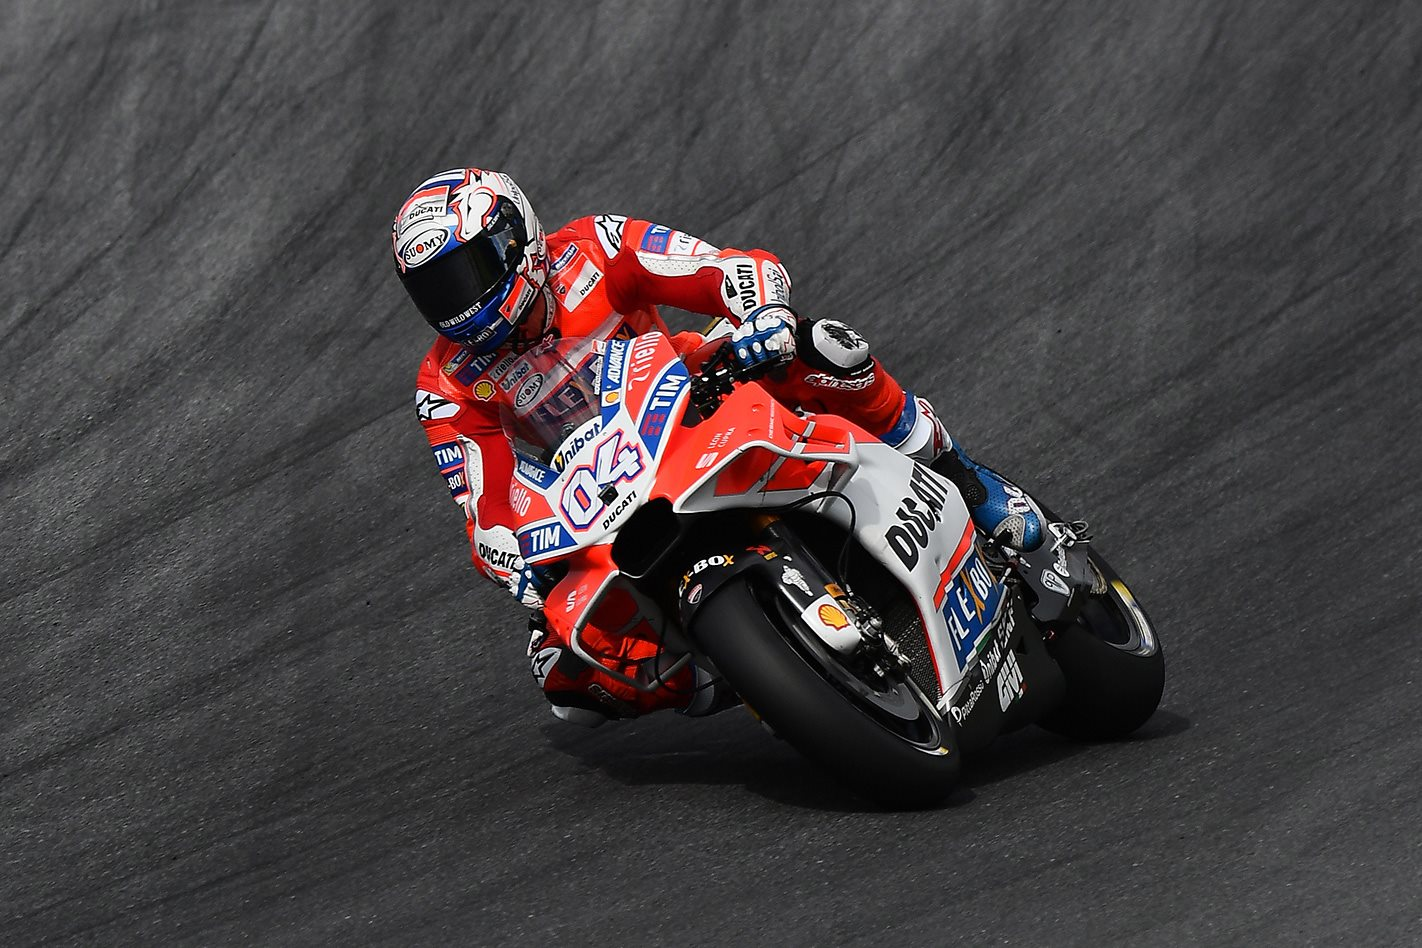 Ducatis Andrea Dovizioso scores a stunner at 2017 Austrian MotoGP